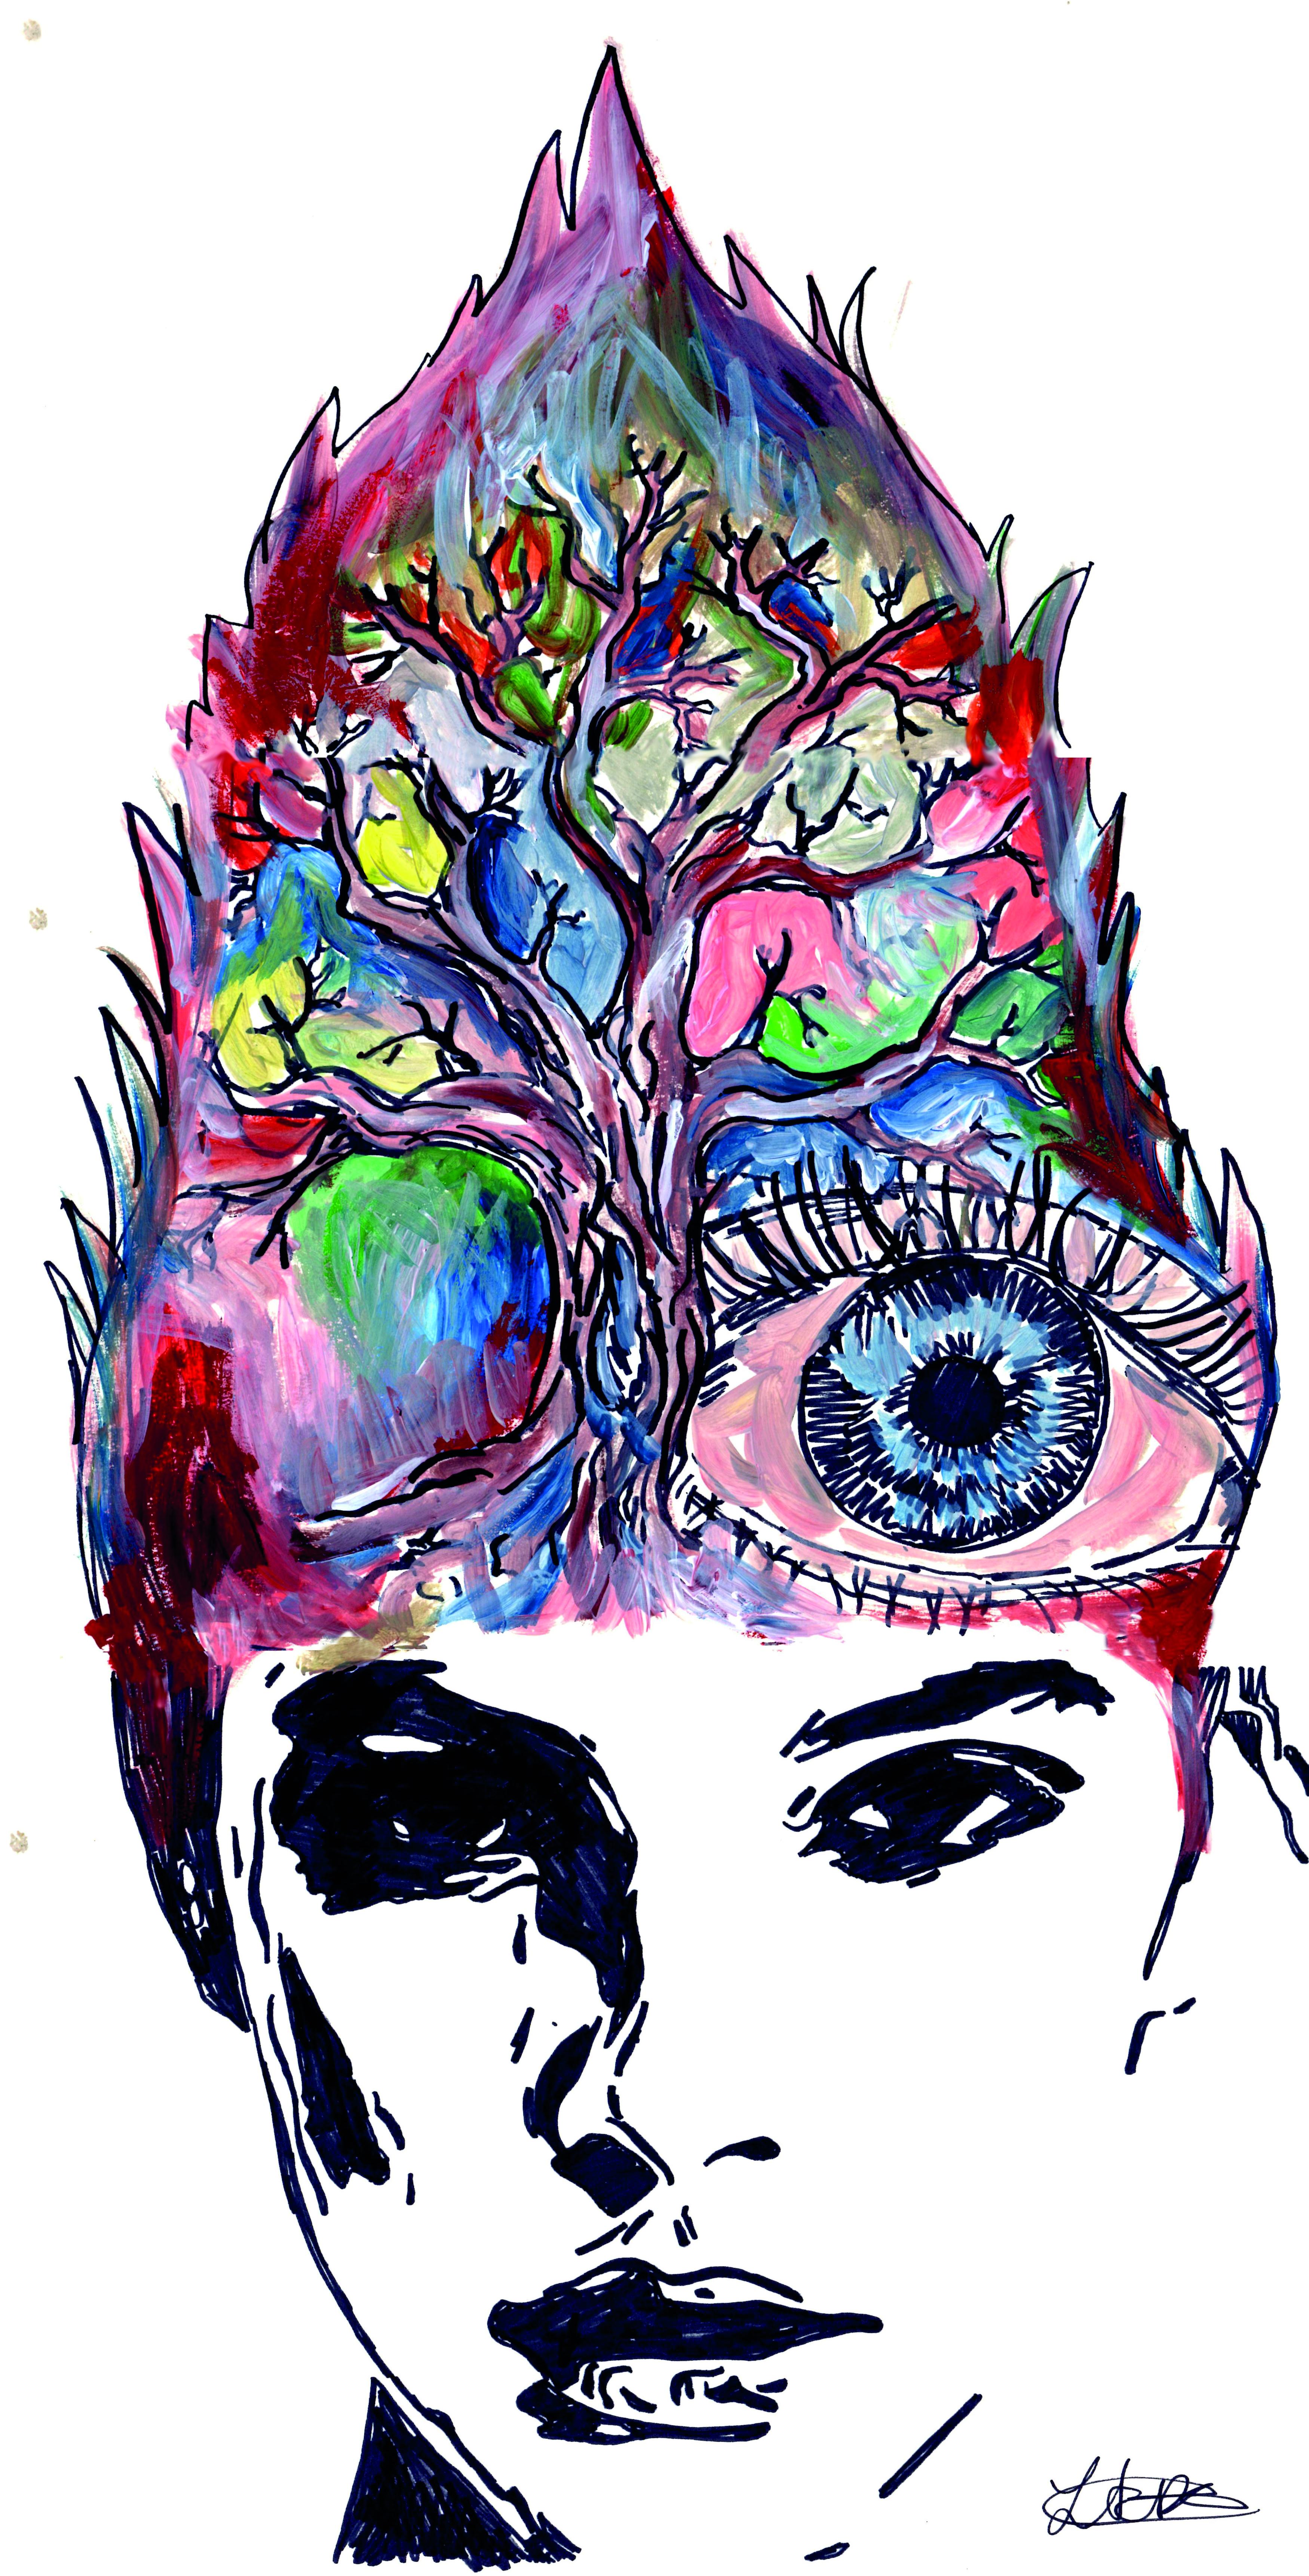 Art and Mental Illness. Illustration: Lucinda Swain for Concrete.Art and Mental Illness. Illustration: Lucinda Swain for Concrete.